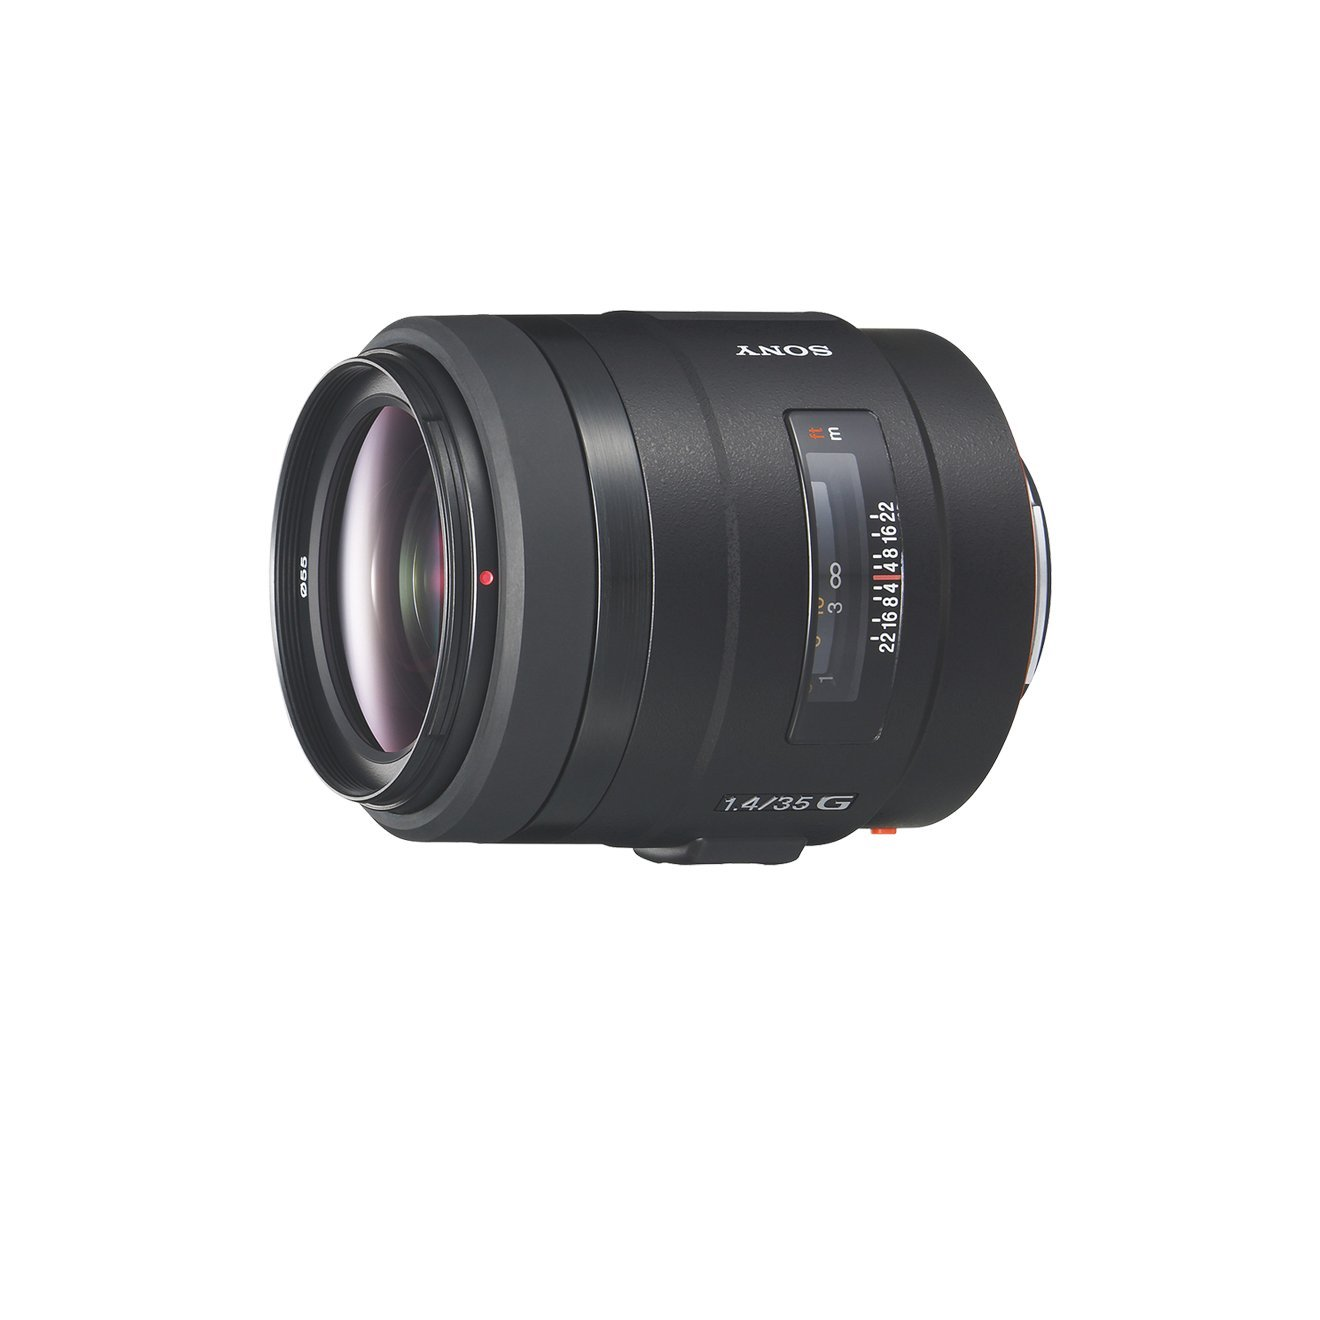 Sony SALFG Objetivo para Sony Minolta distancia focal fija mm apertura f